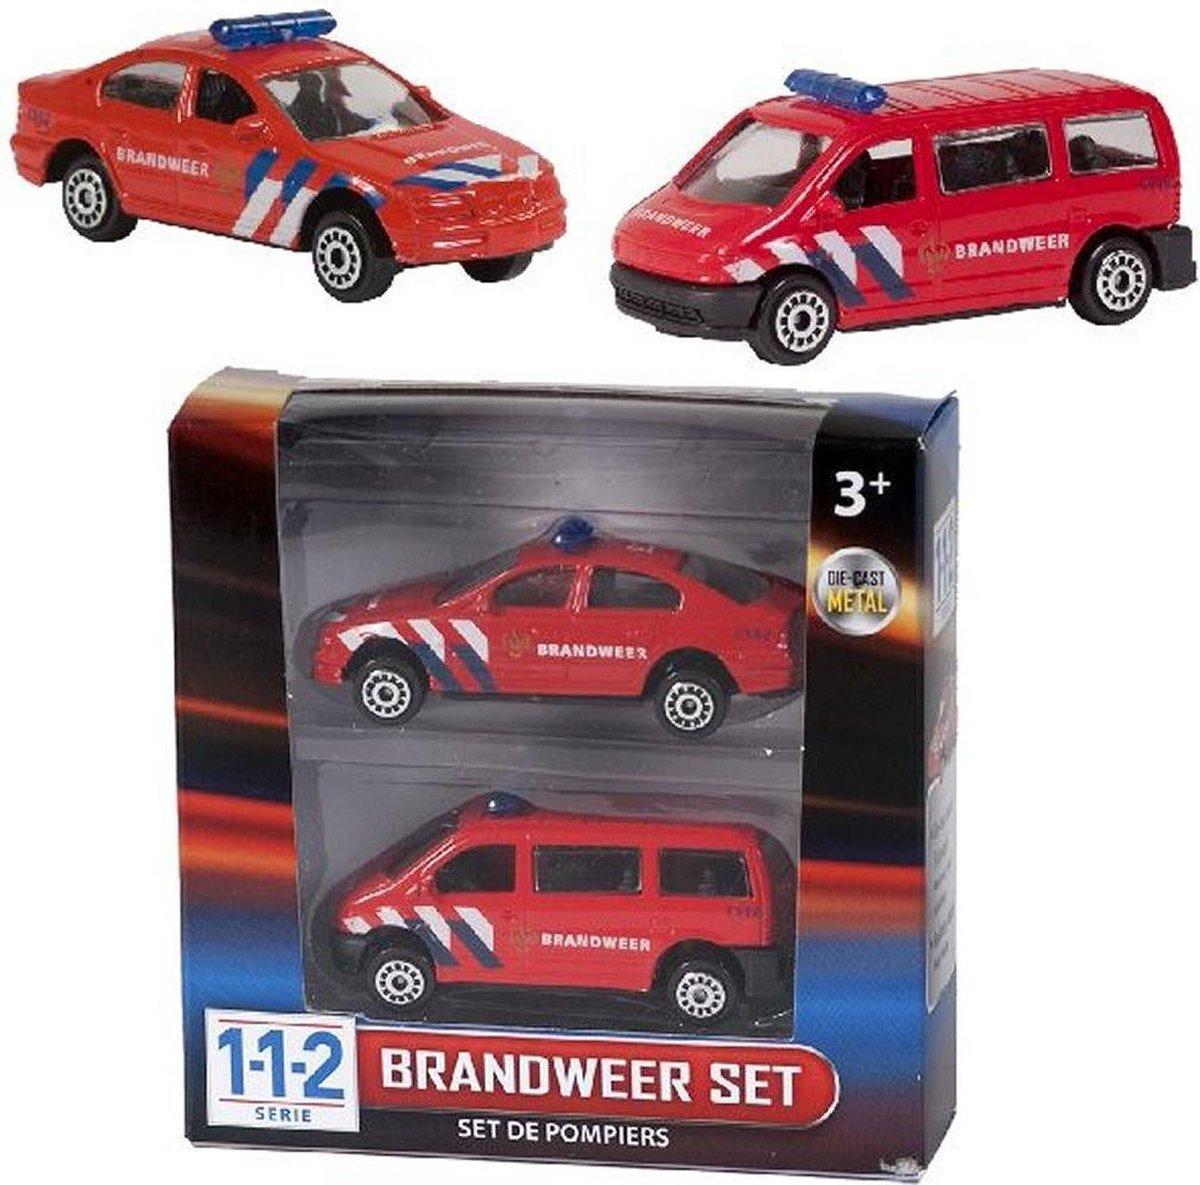 112 Serie